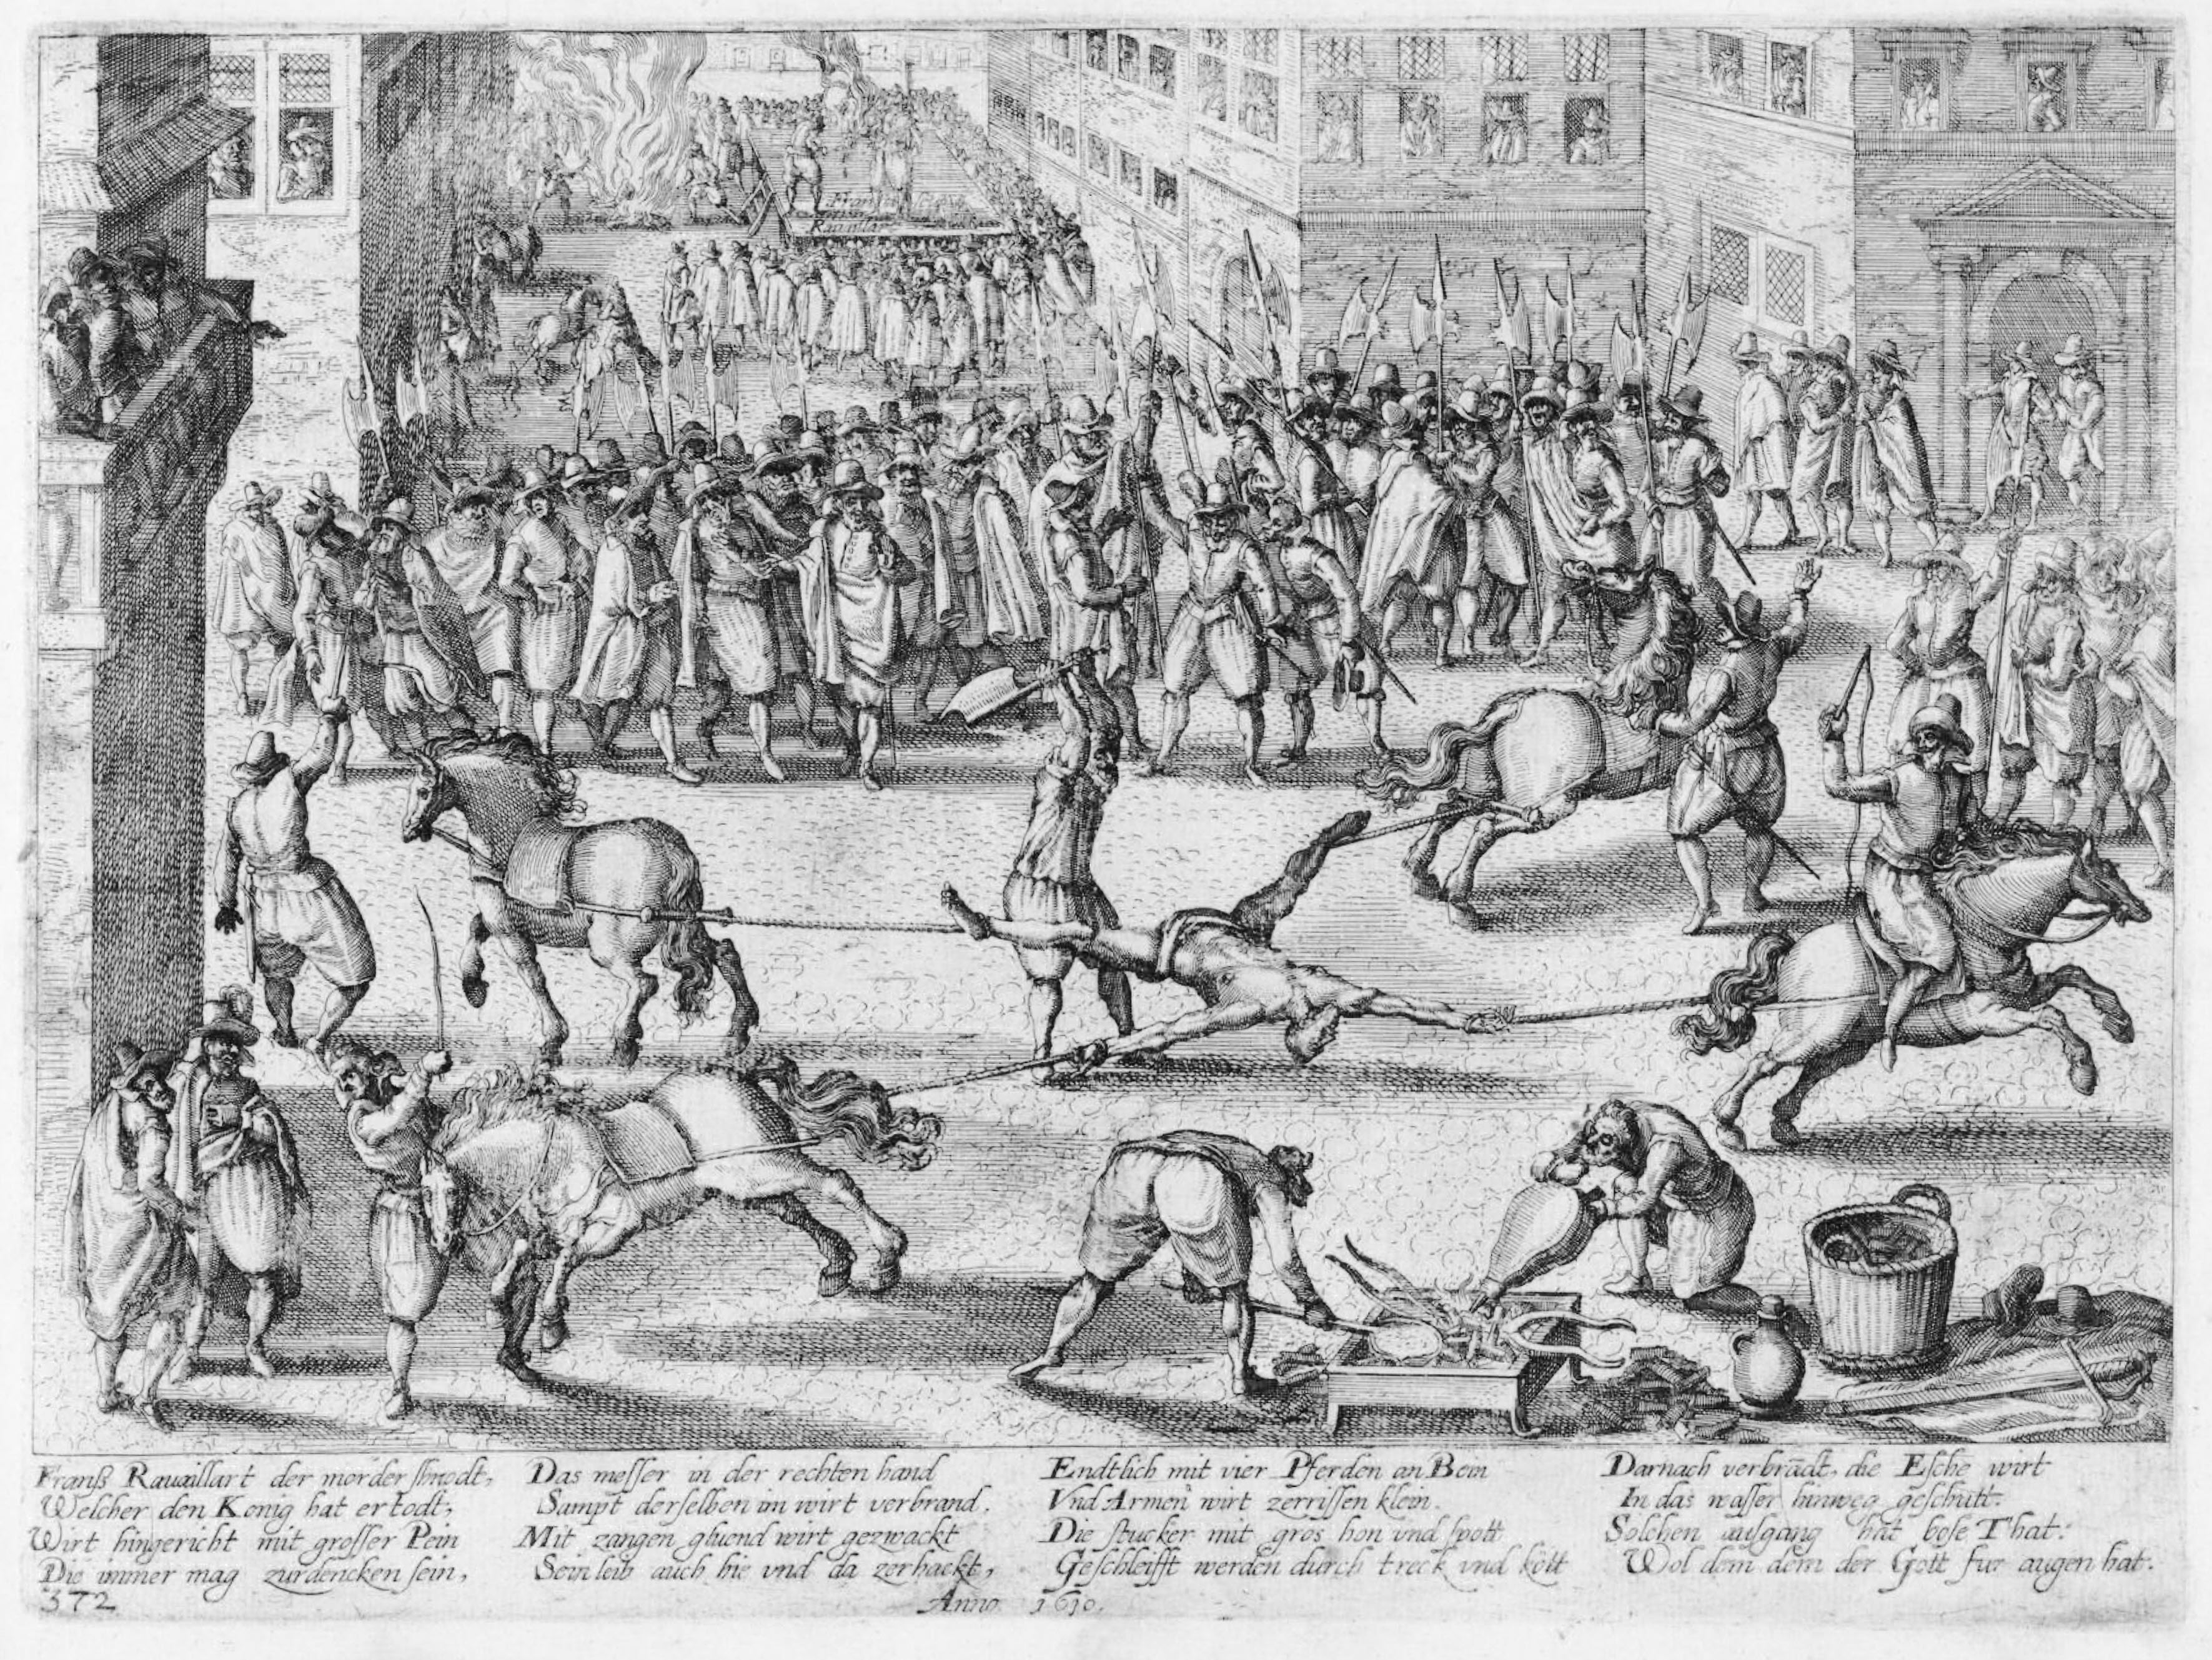 Franz Hogenberg Franss Rauaillart der morder shnodt 1610